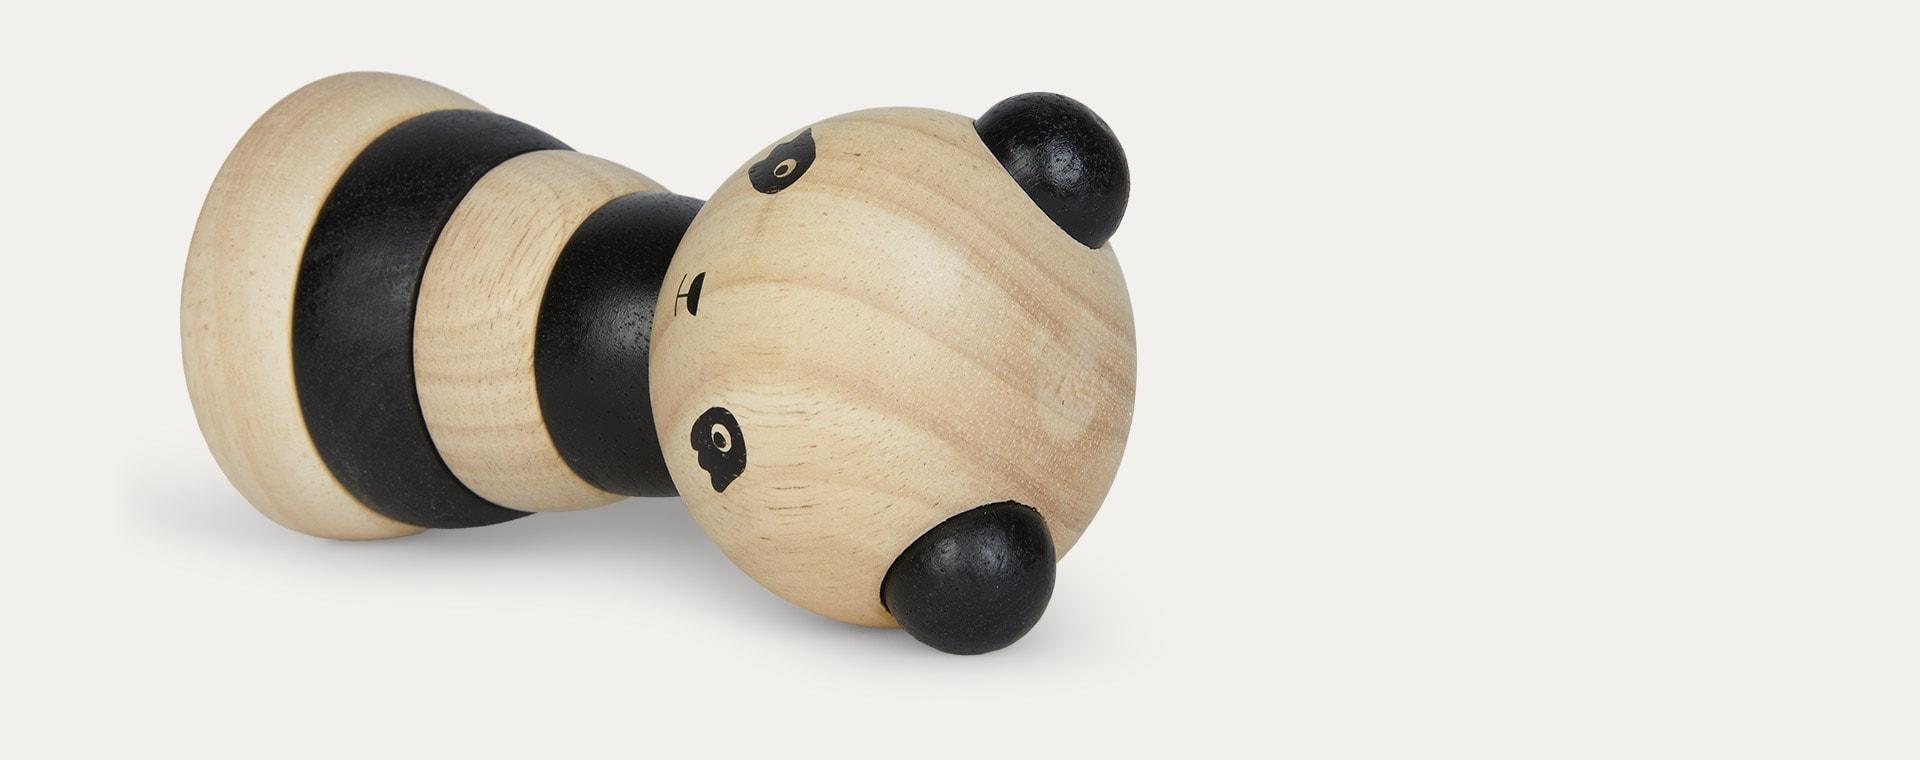 Panda Wee Gallery Wooden Stacker